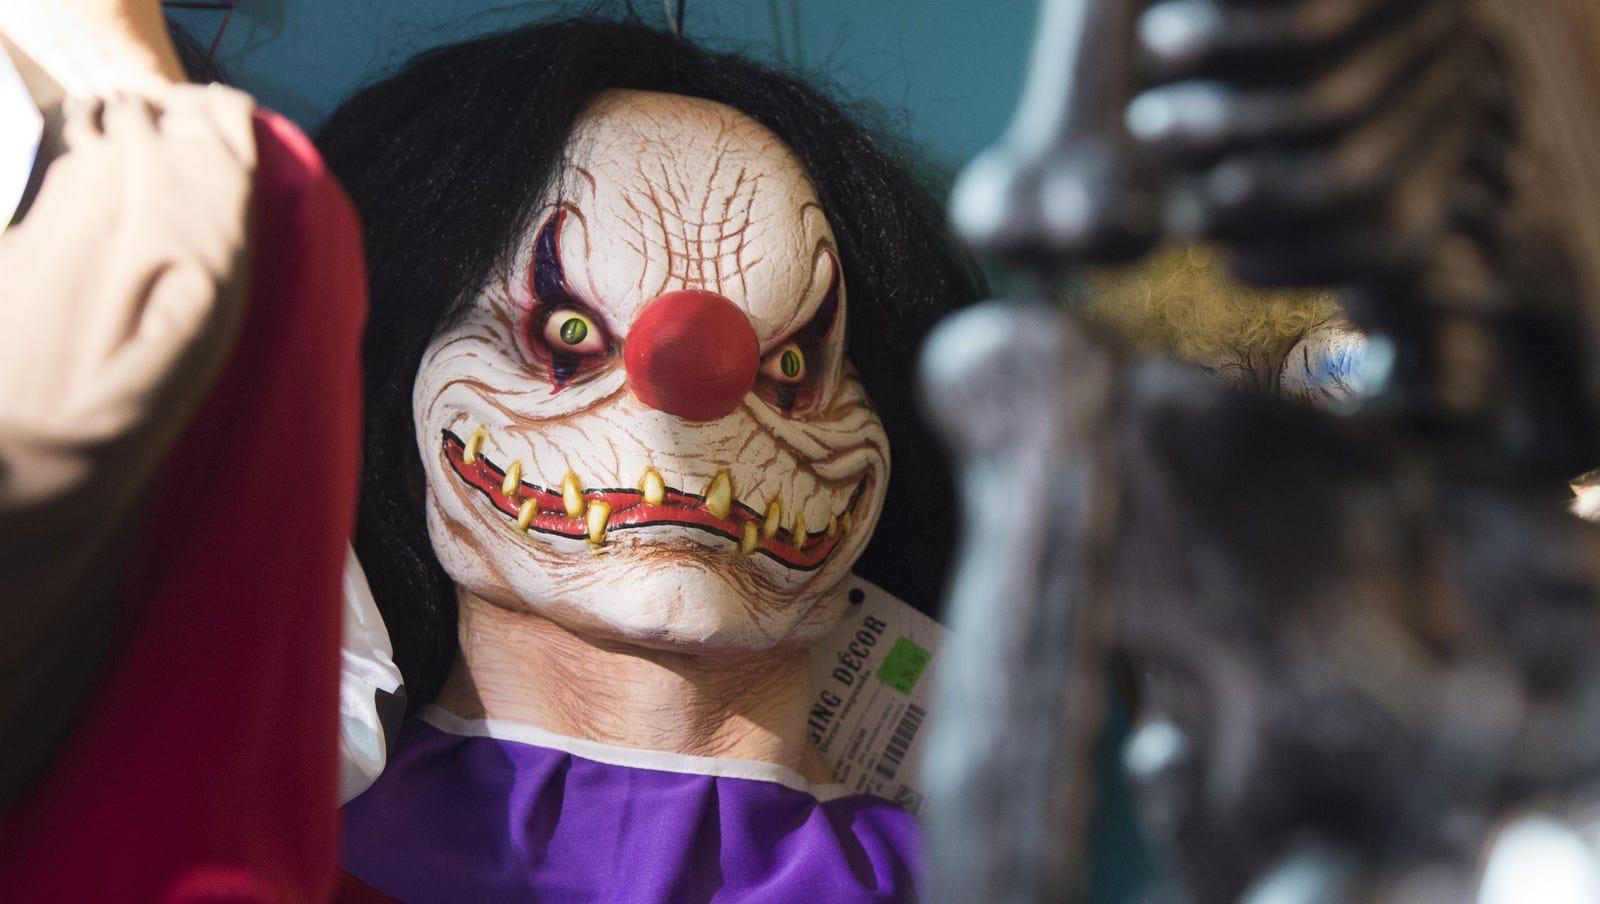 n.j. school district bans creepy clown costumes